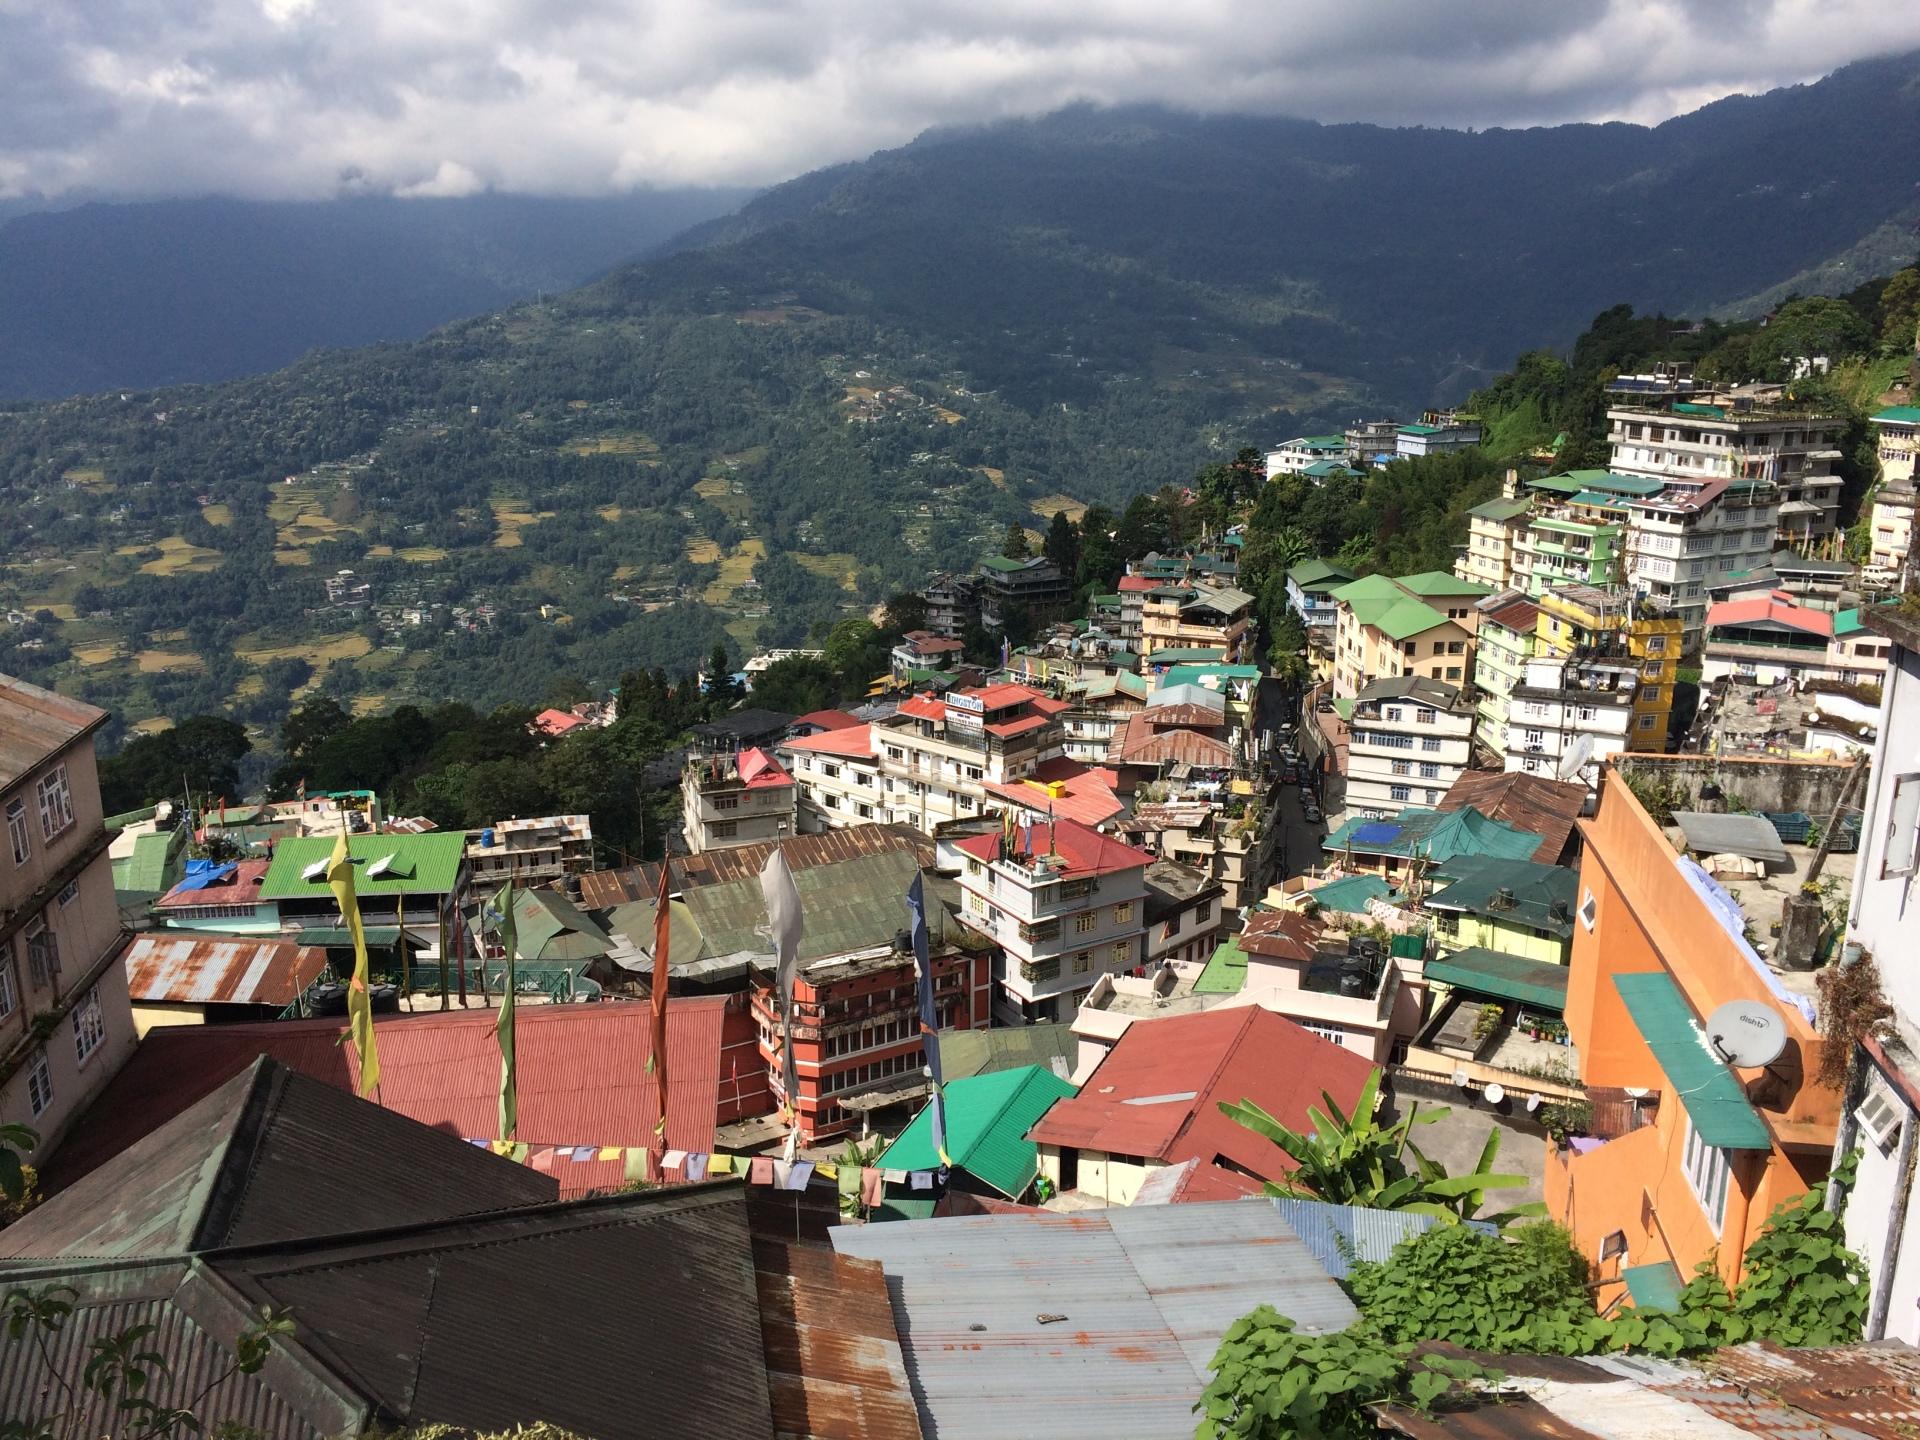 2017: View of Gangtok